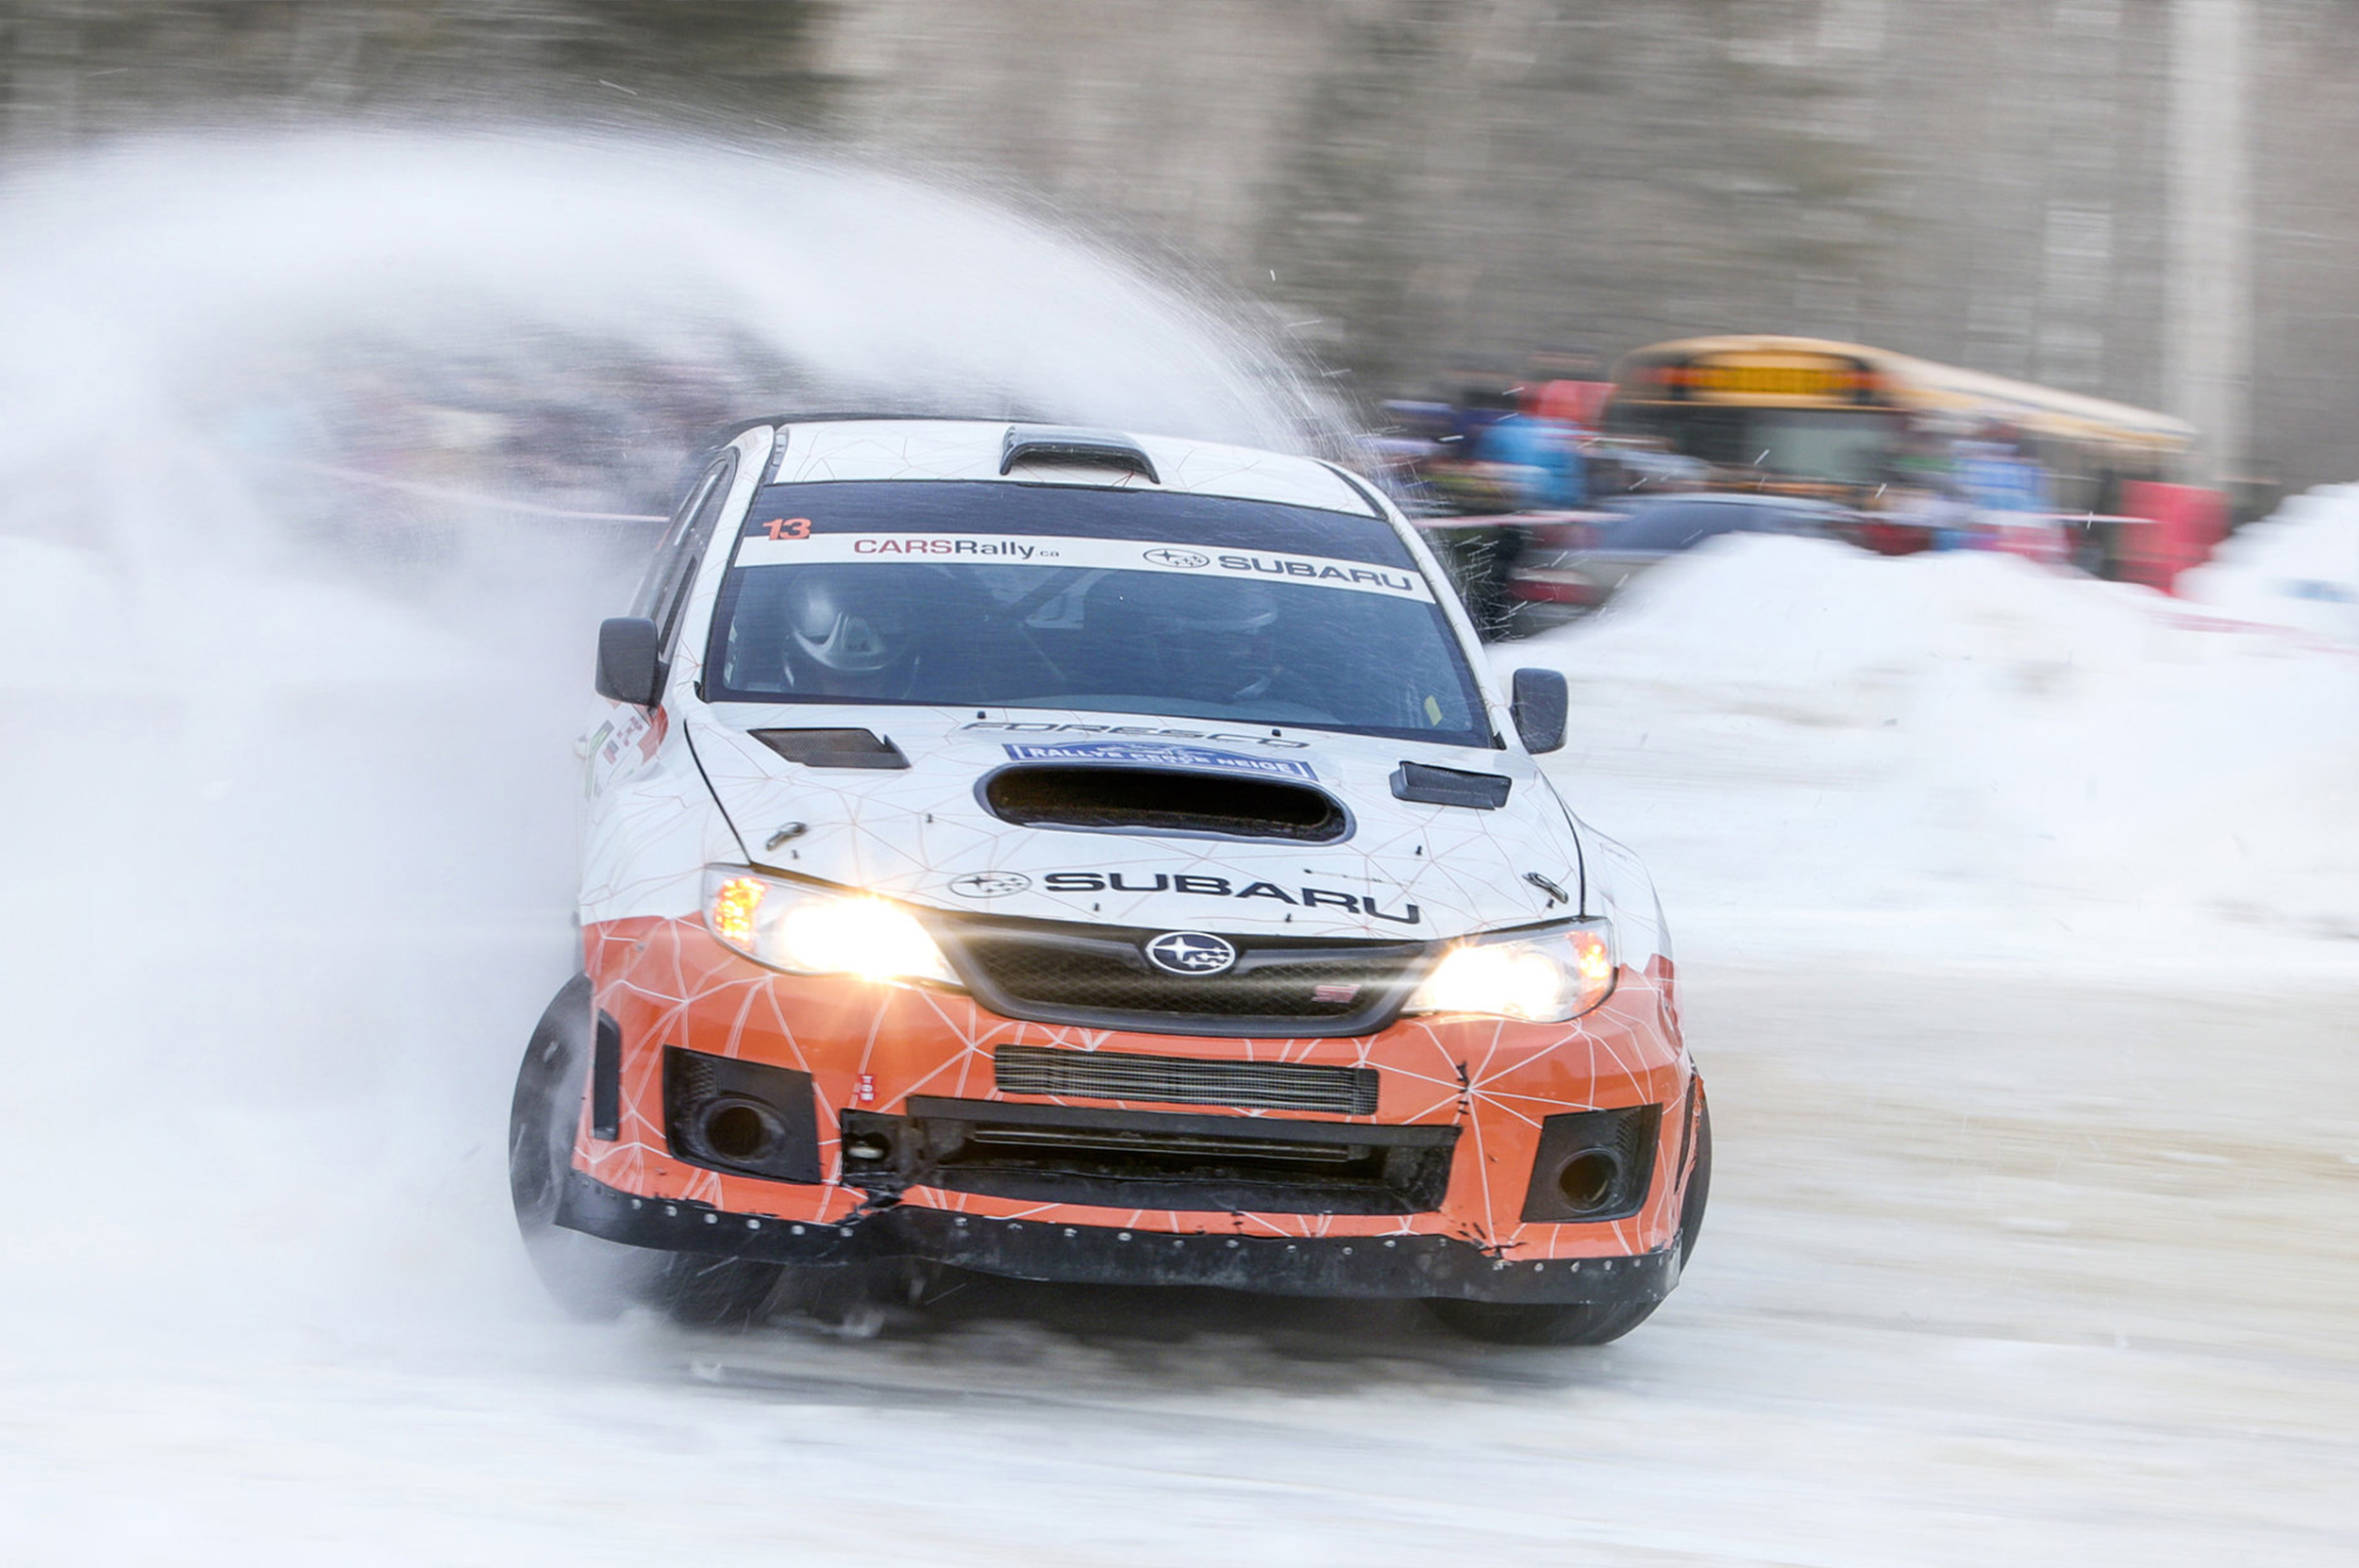 Rally02.jpg